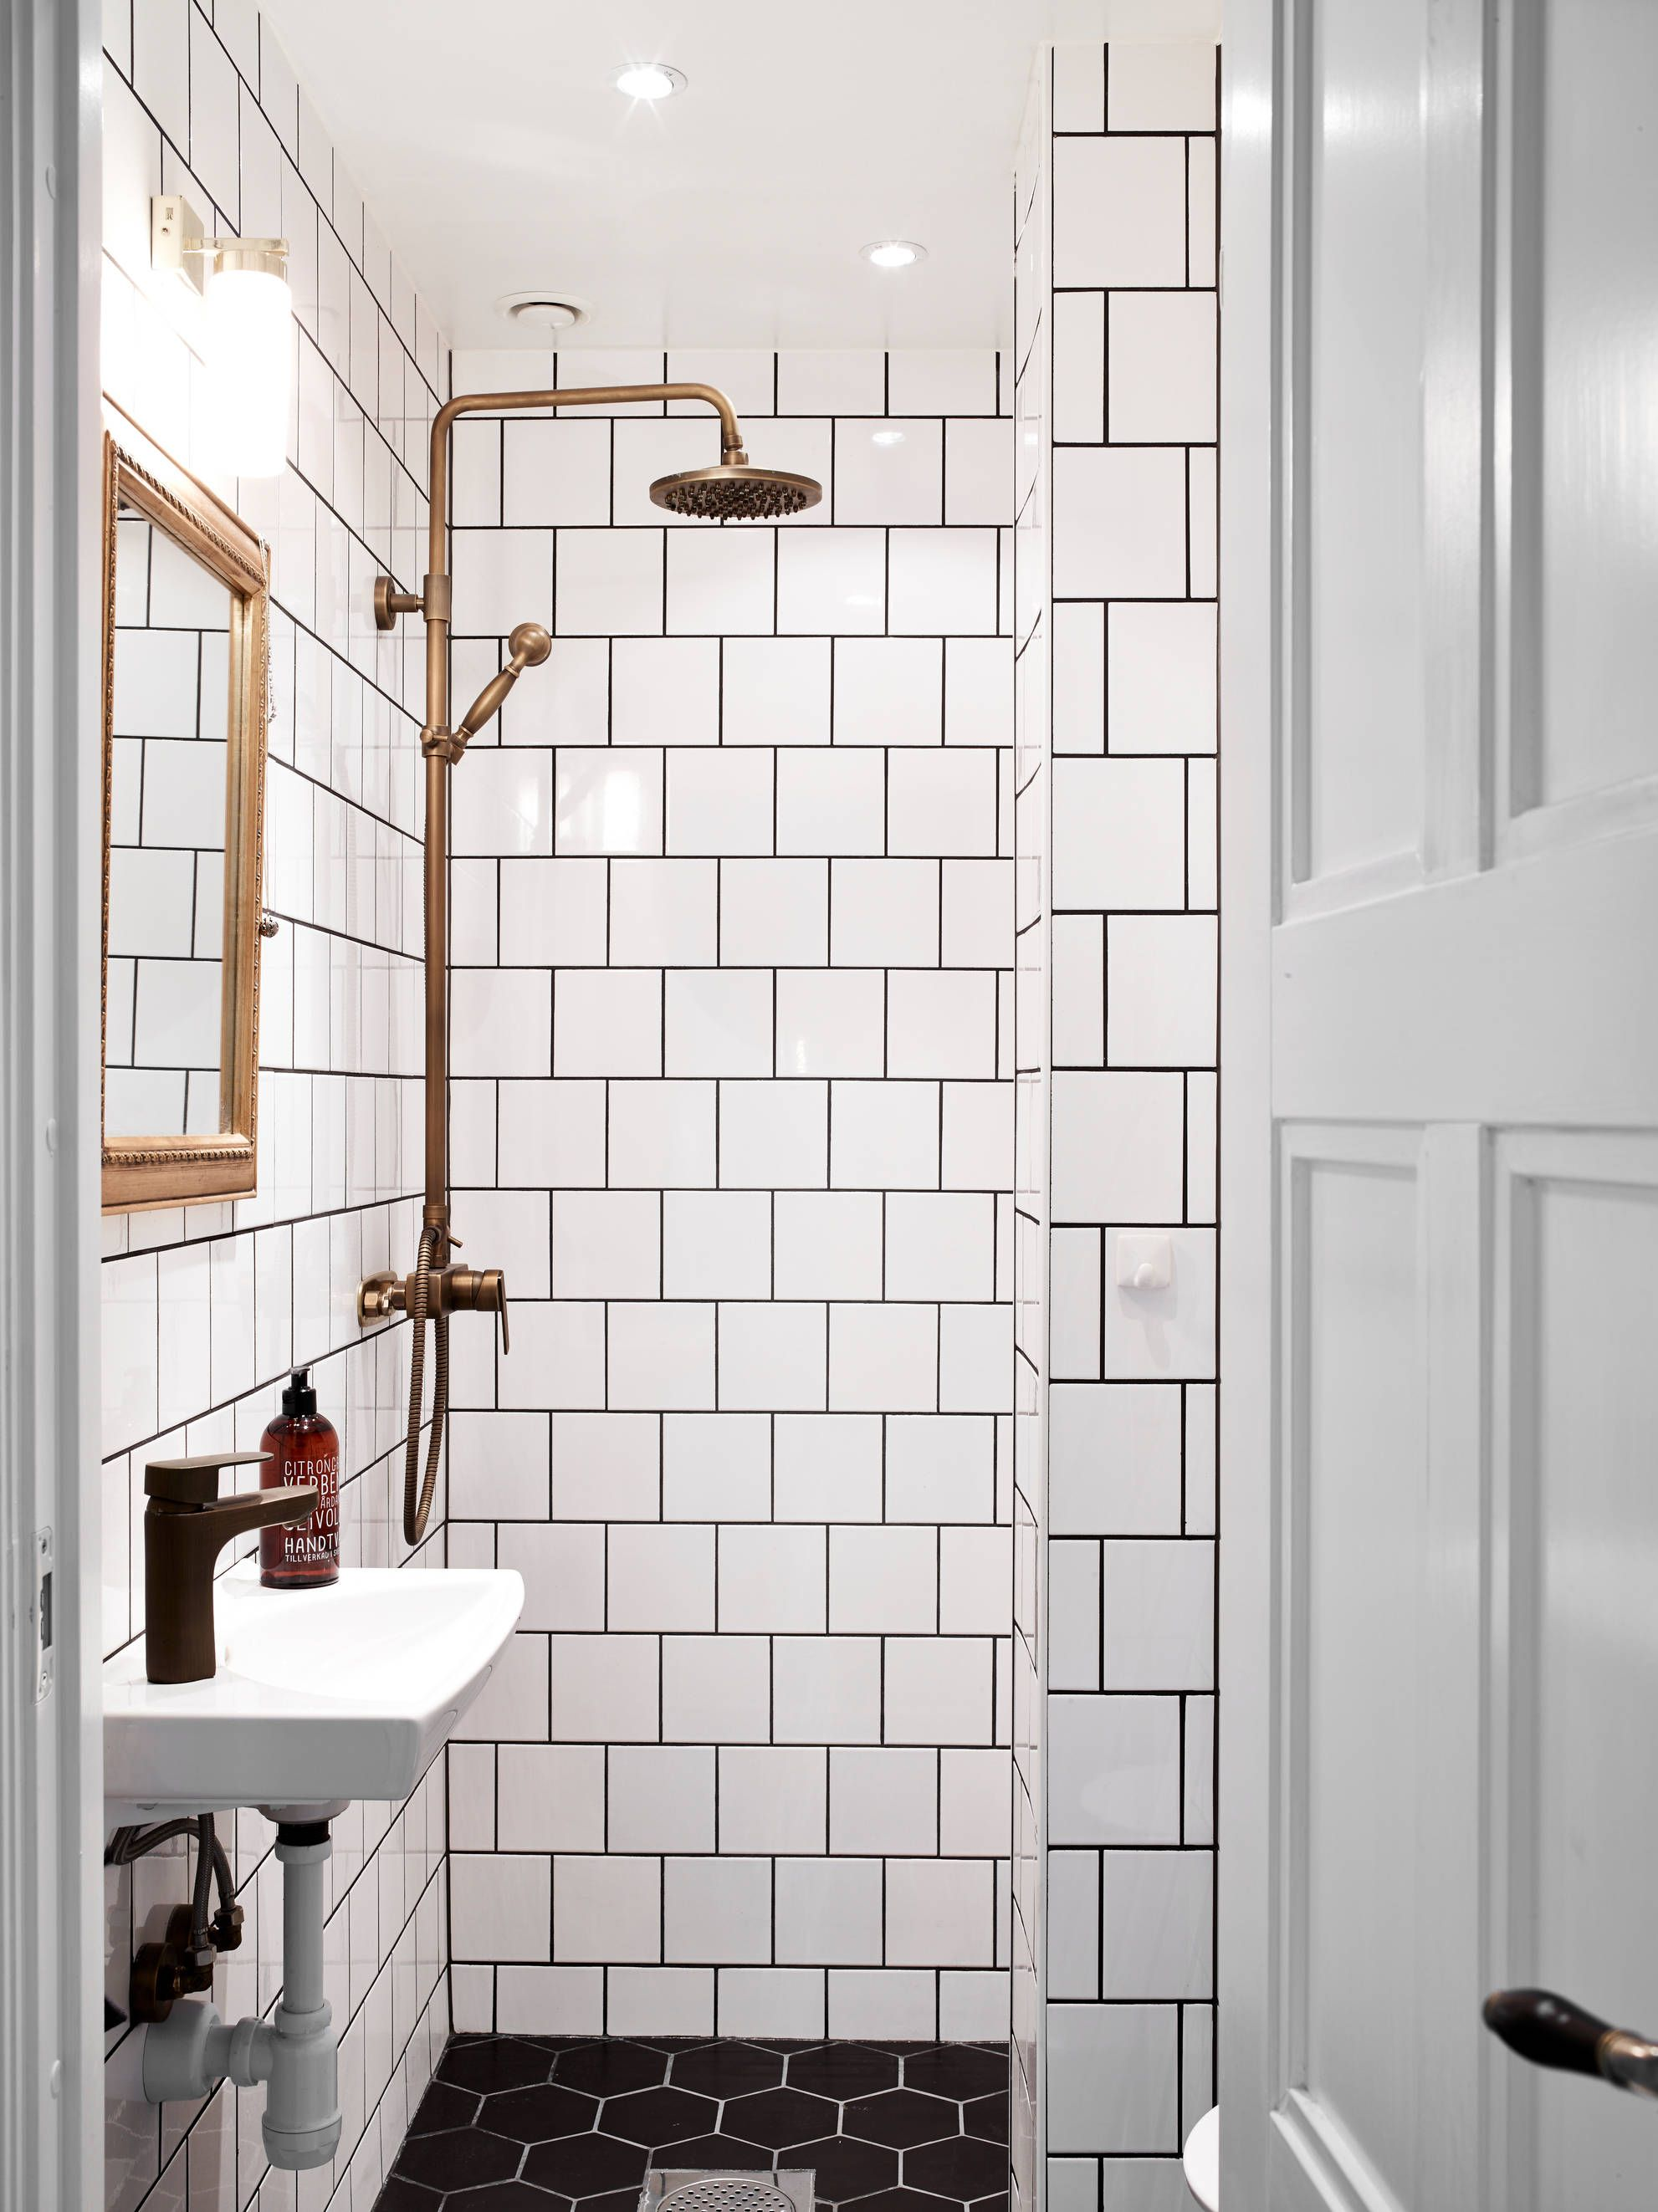 of tile size floor and full design interiors lovely white vintage luxury beautiful bathroom new floors original black